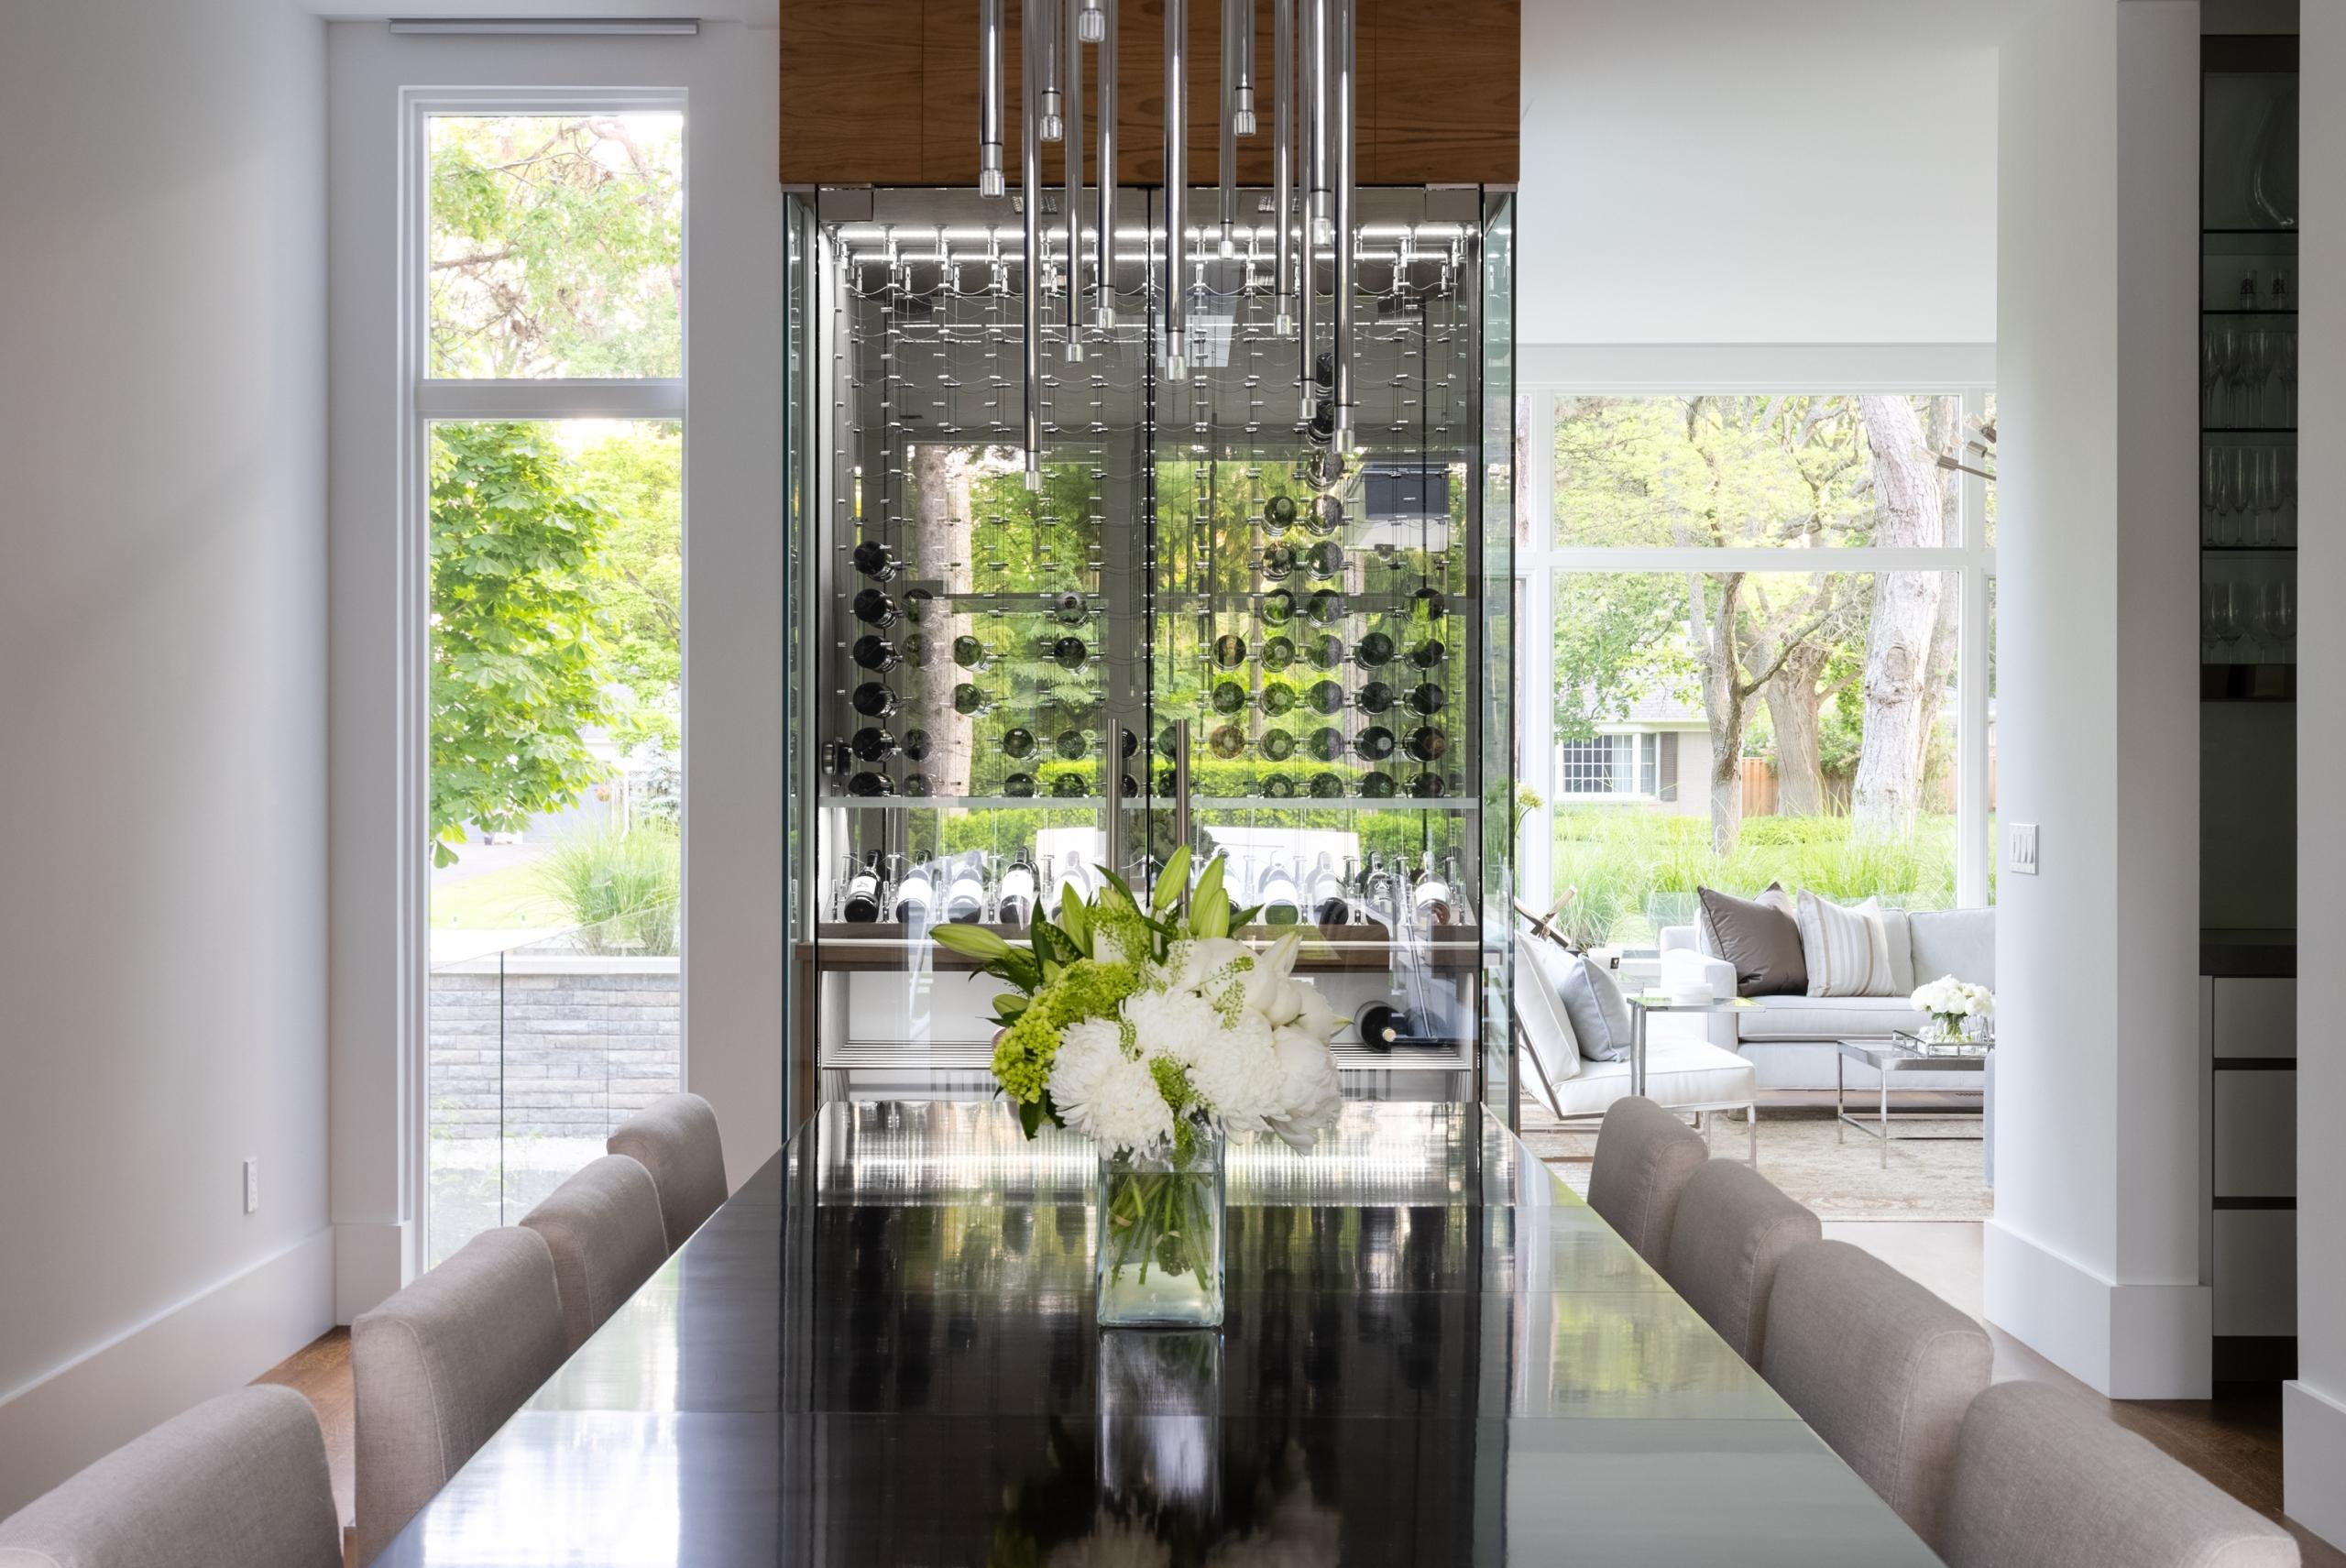 Dining area featured at 65 Cox Drive, Oakville at Alex Irish & Associates